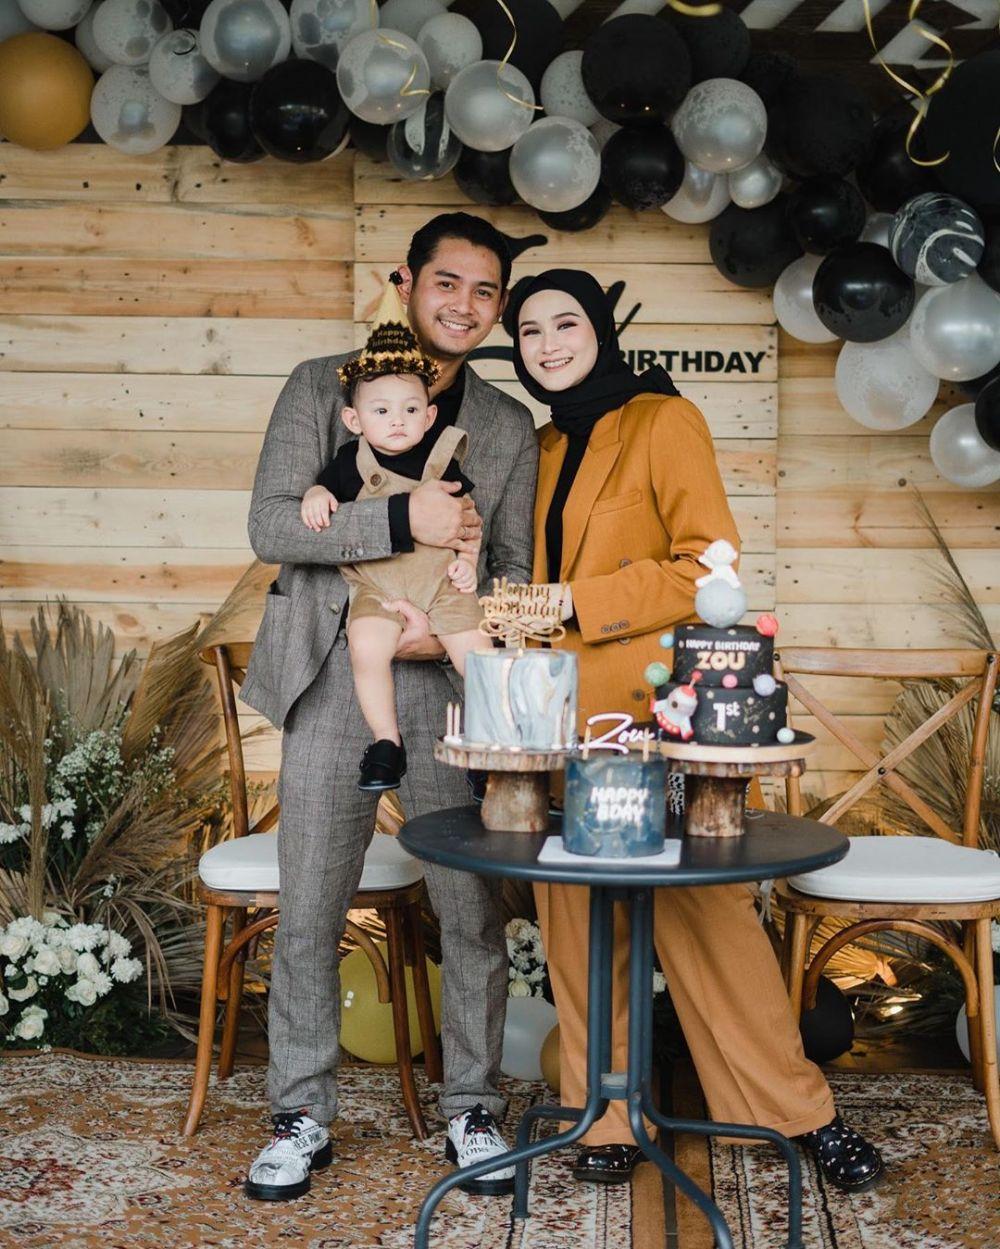 Setelah Menikah 10 Artis Ini Langsung Punya Momongan, Bahagianya